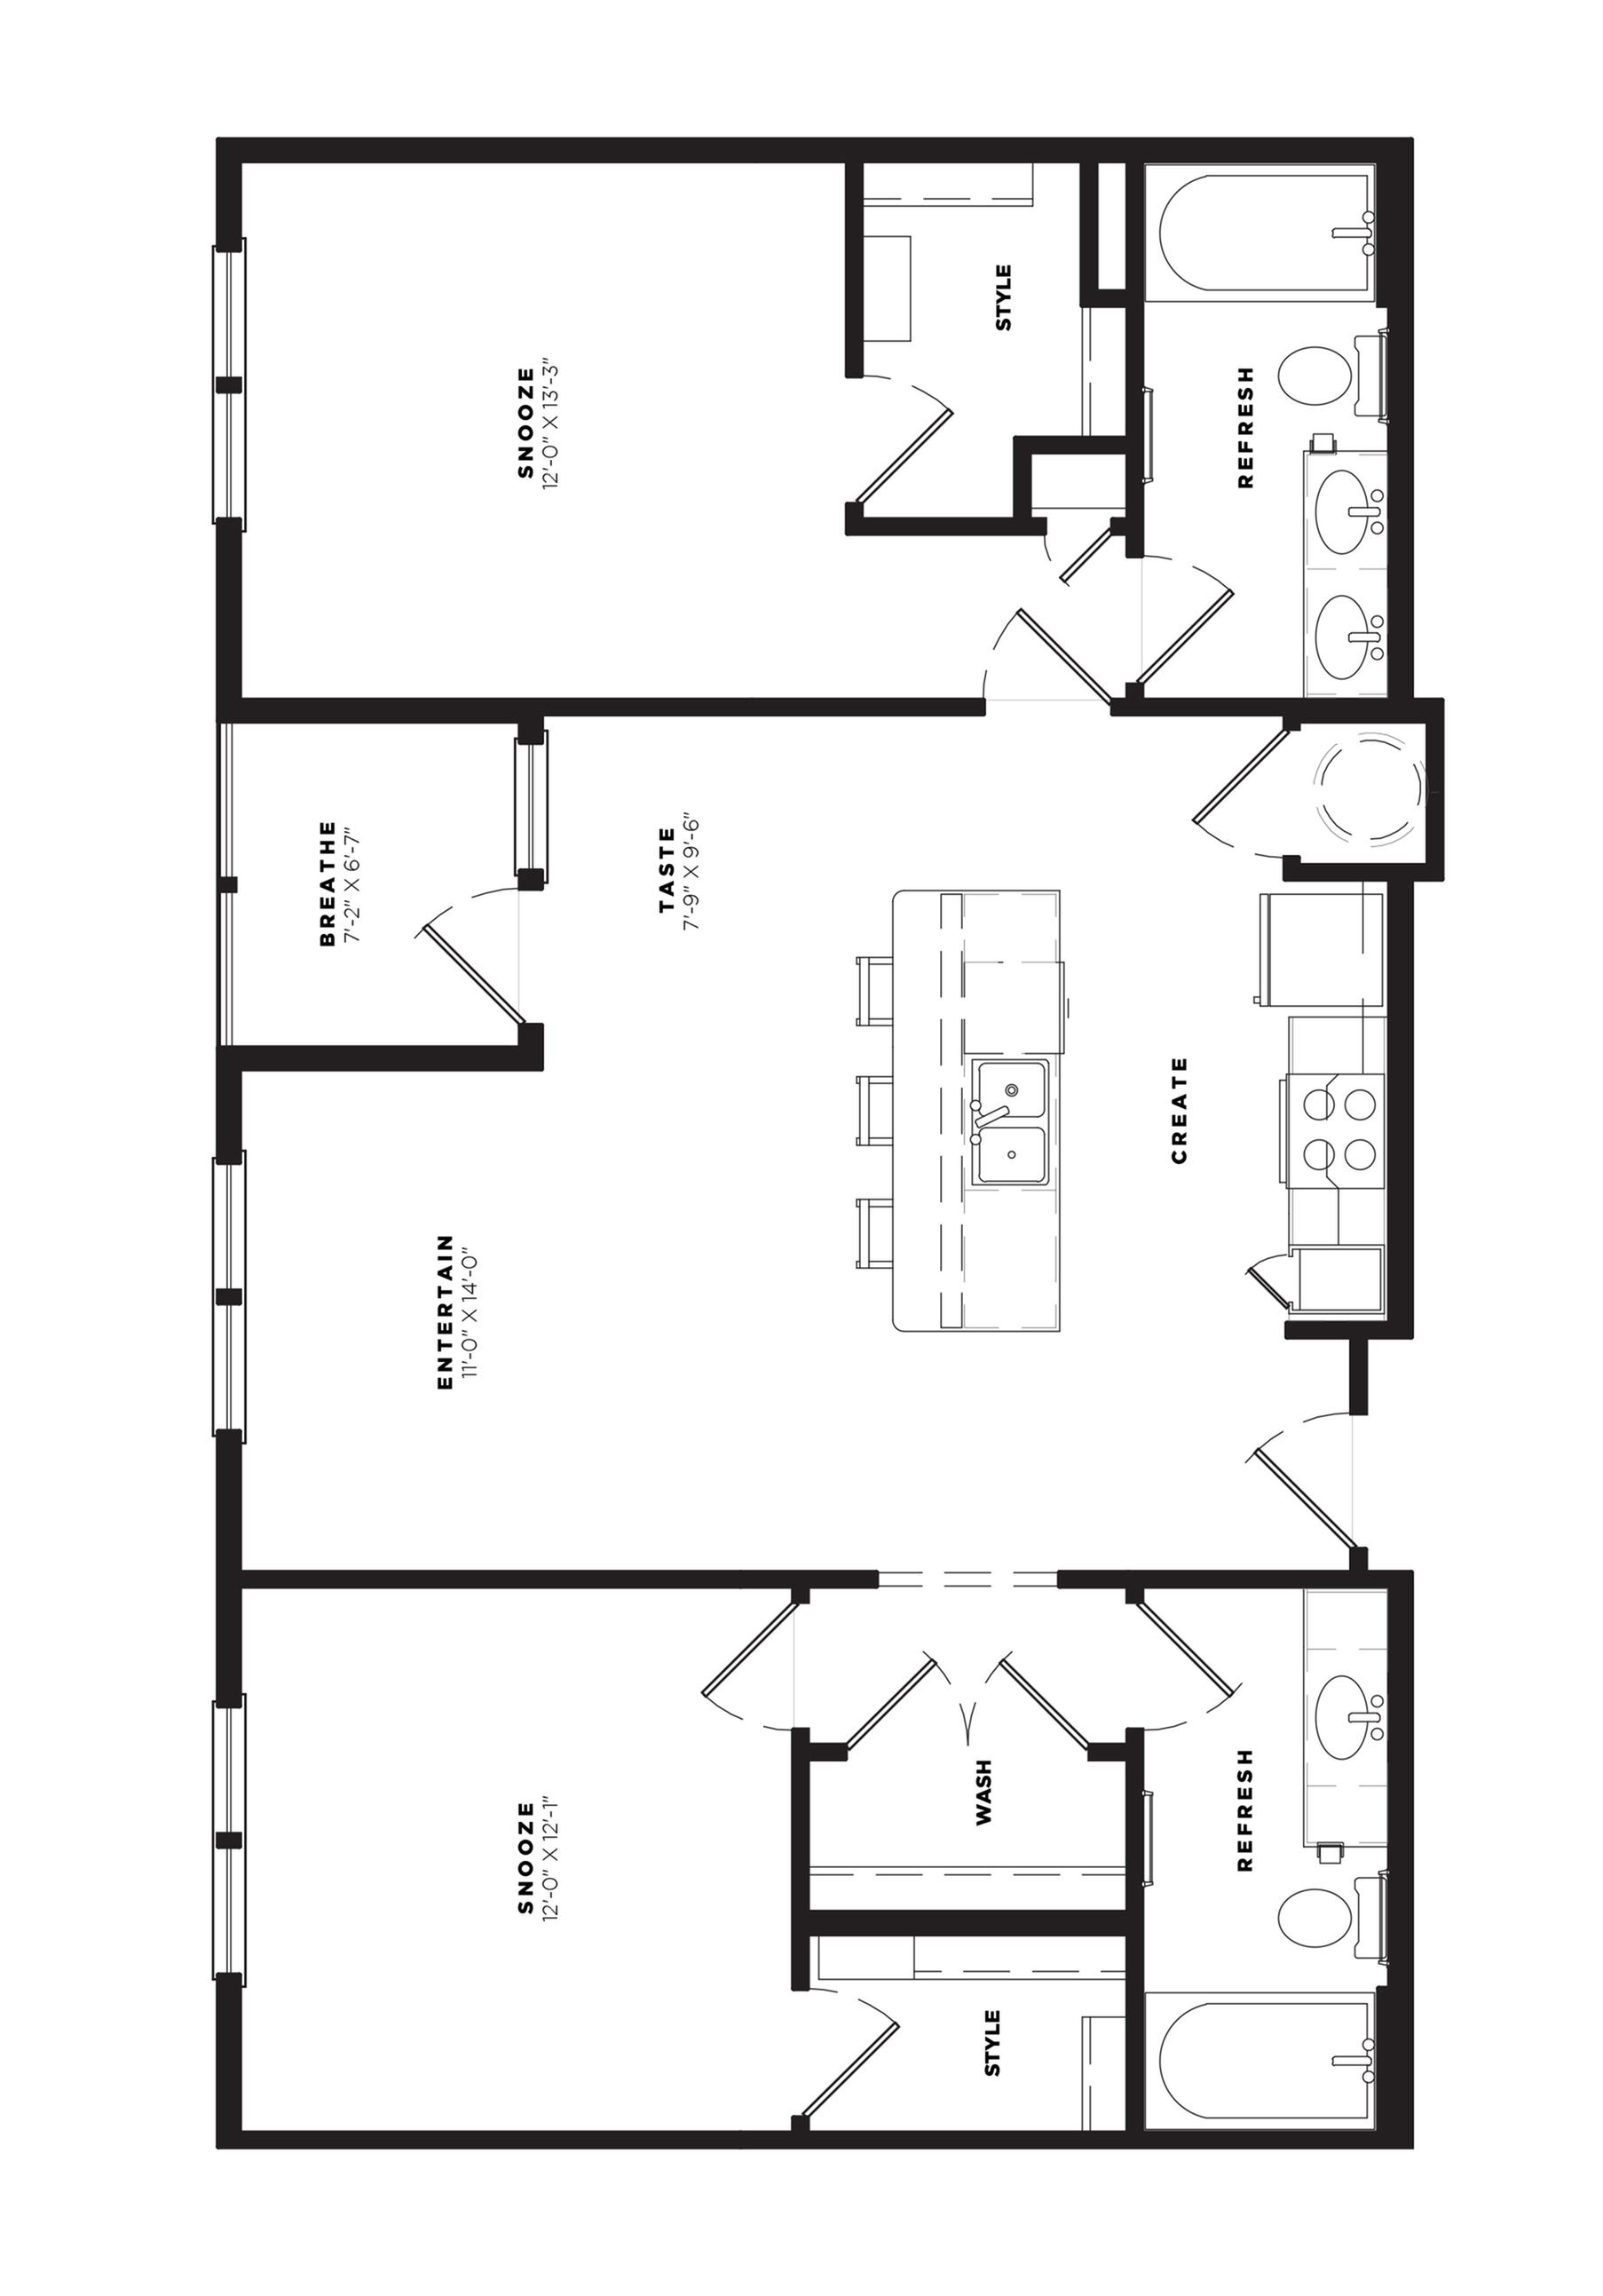 B2 Alt 4 Floor Plan